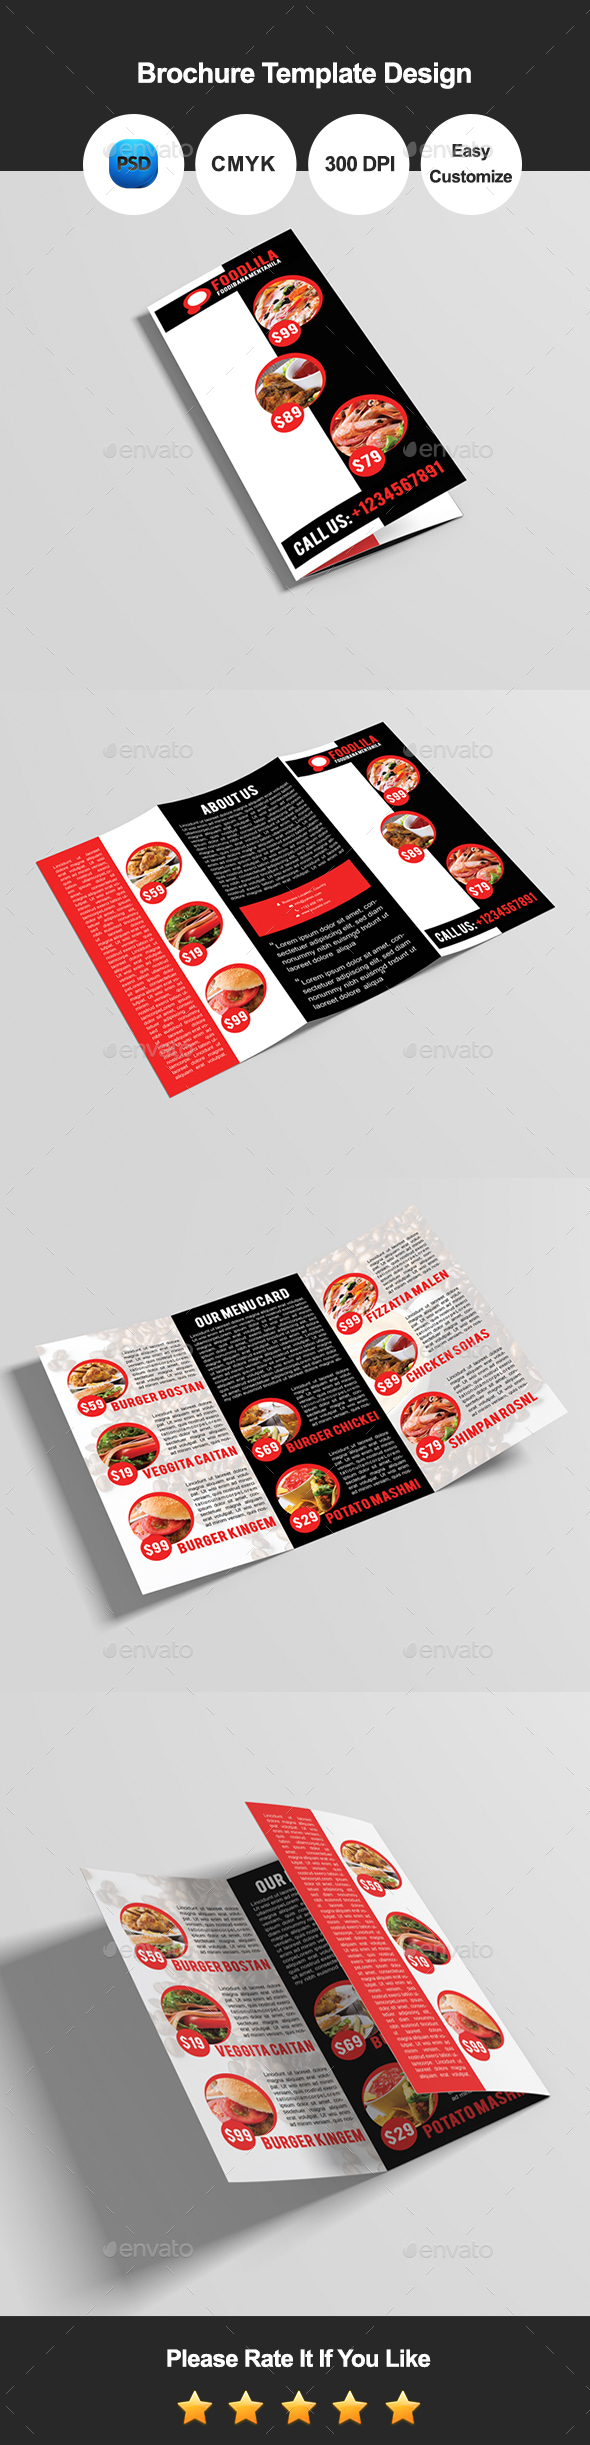 Foodlila Tri Fold Food & Restaurant Brochure Template Design - Catalogs Brochures